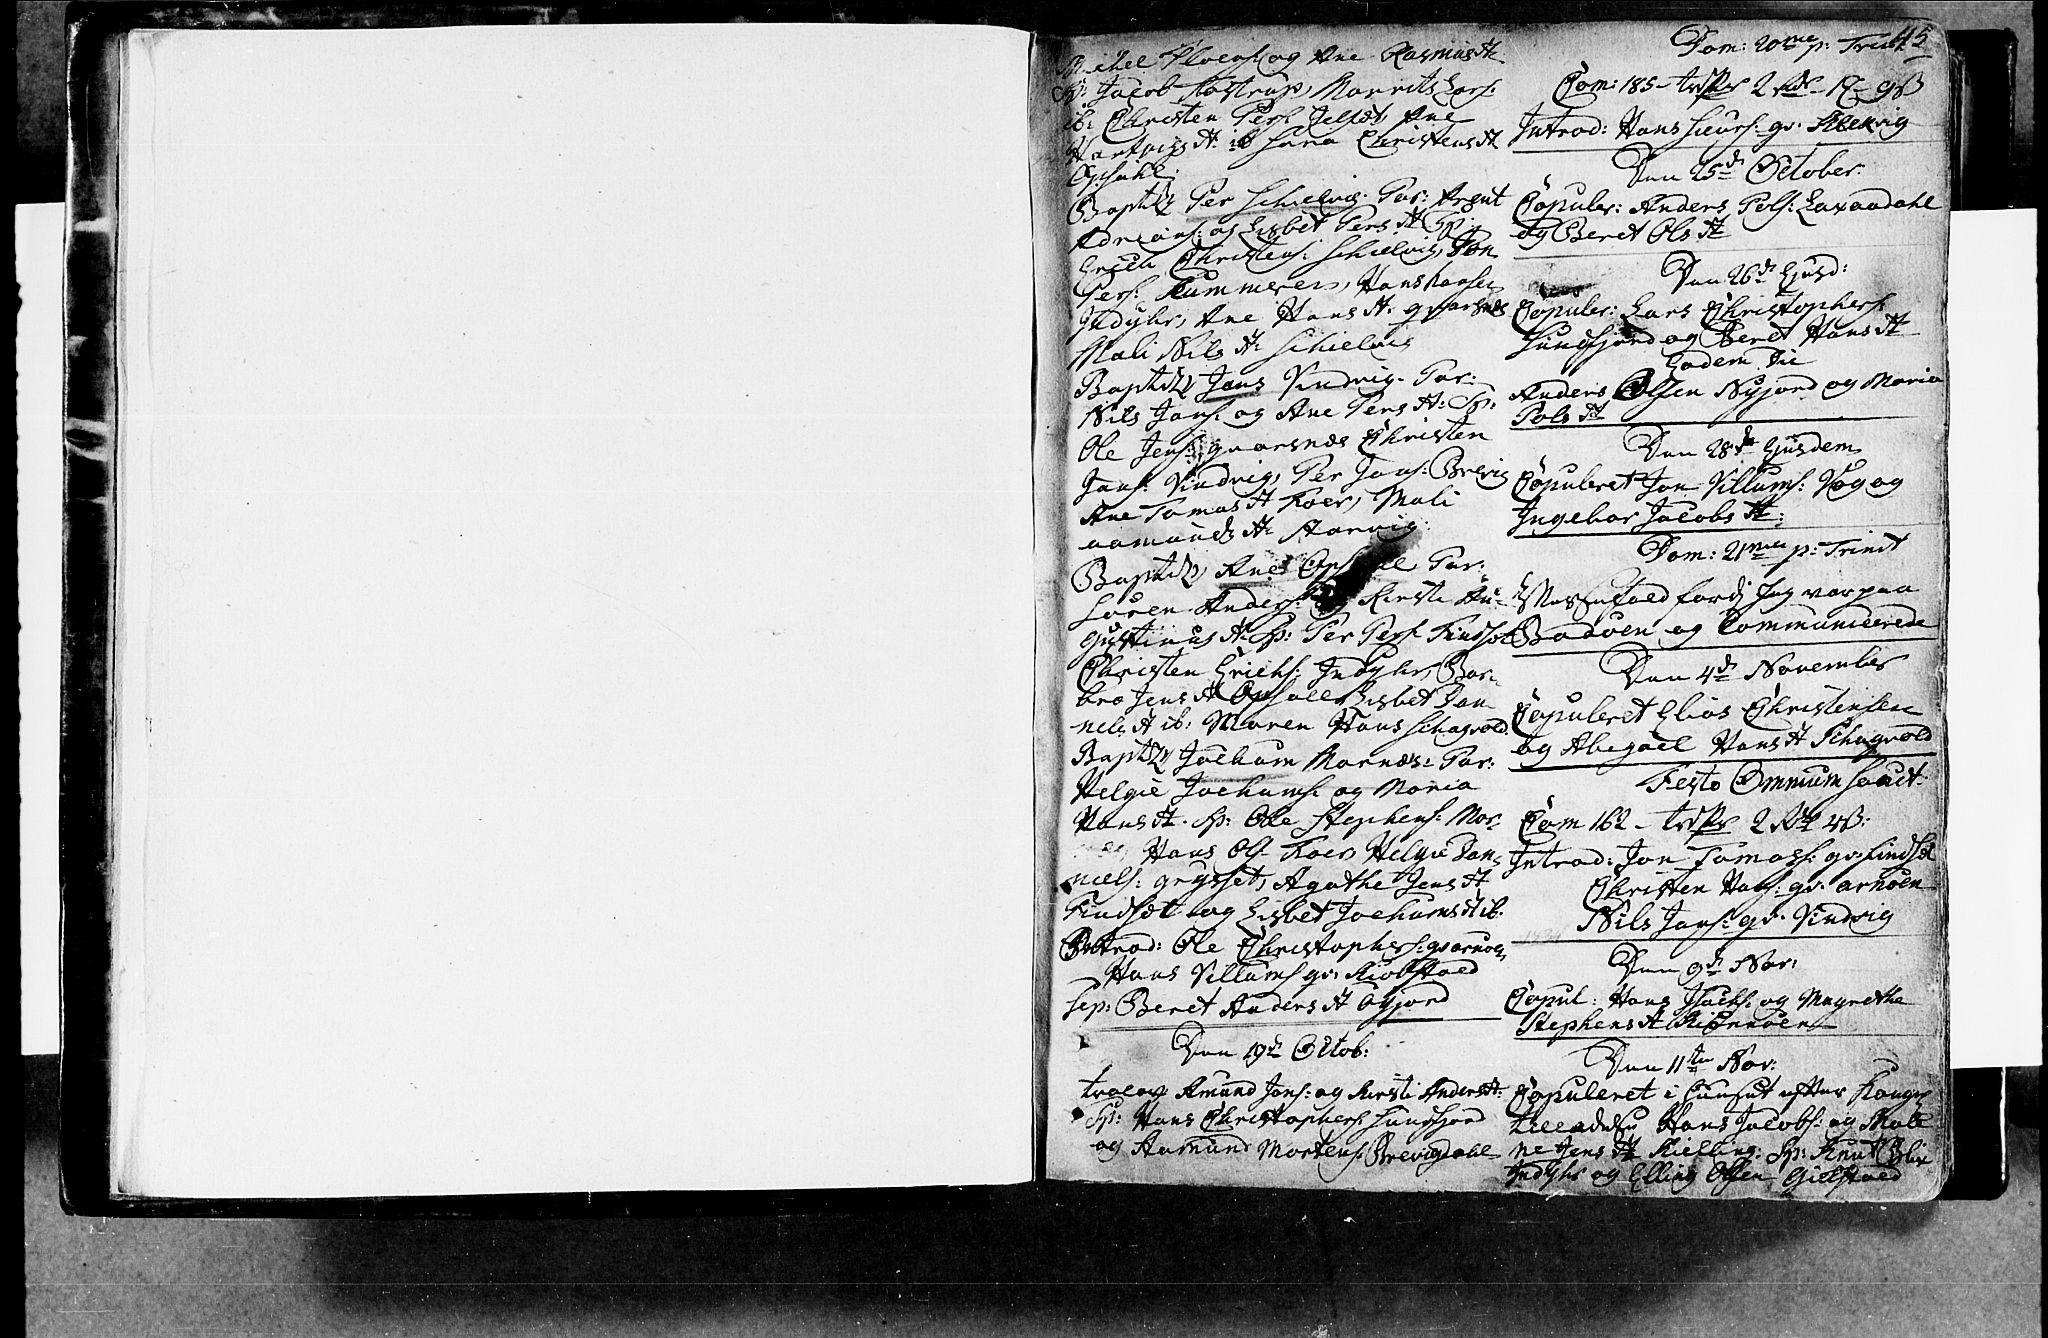 SAT, Ministerialprotokoller, klokkerbøker og fødselsregistre - Nordland, 805/L0094: Ministerialbok nr. 805A01, 1773-1804, s. 44-45